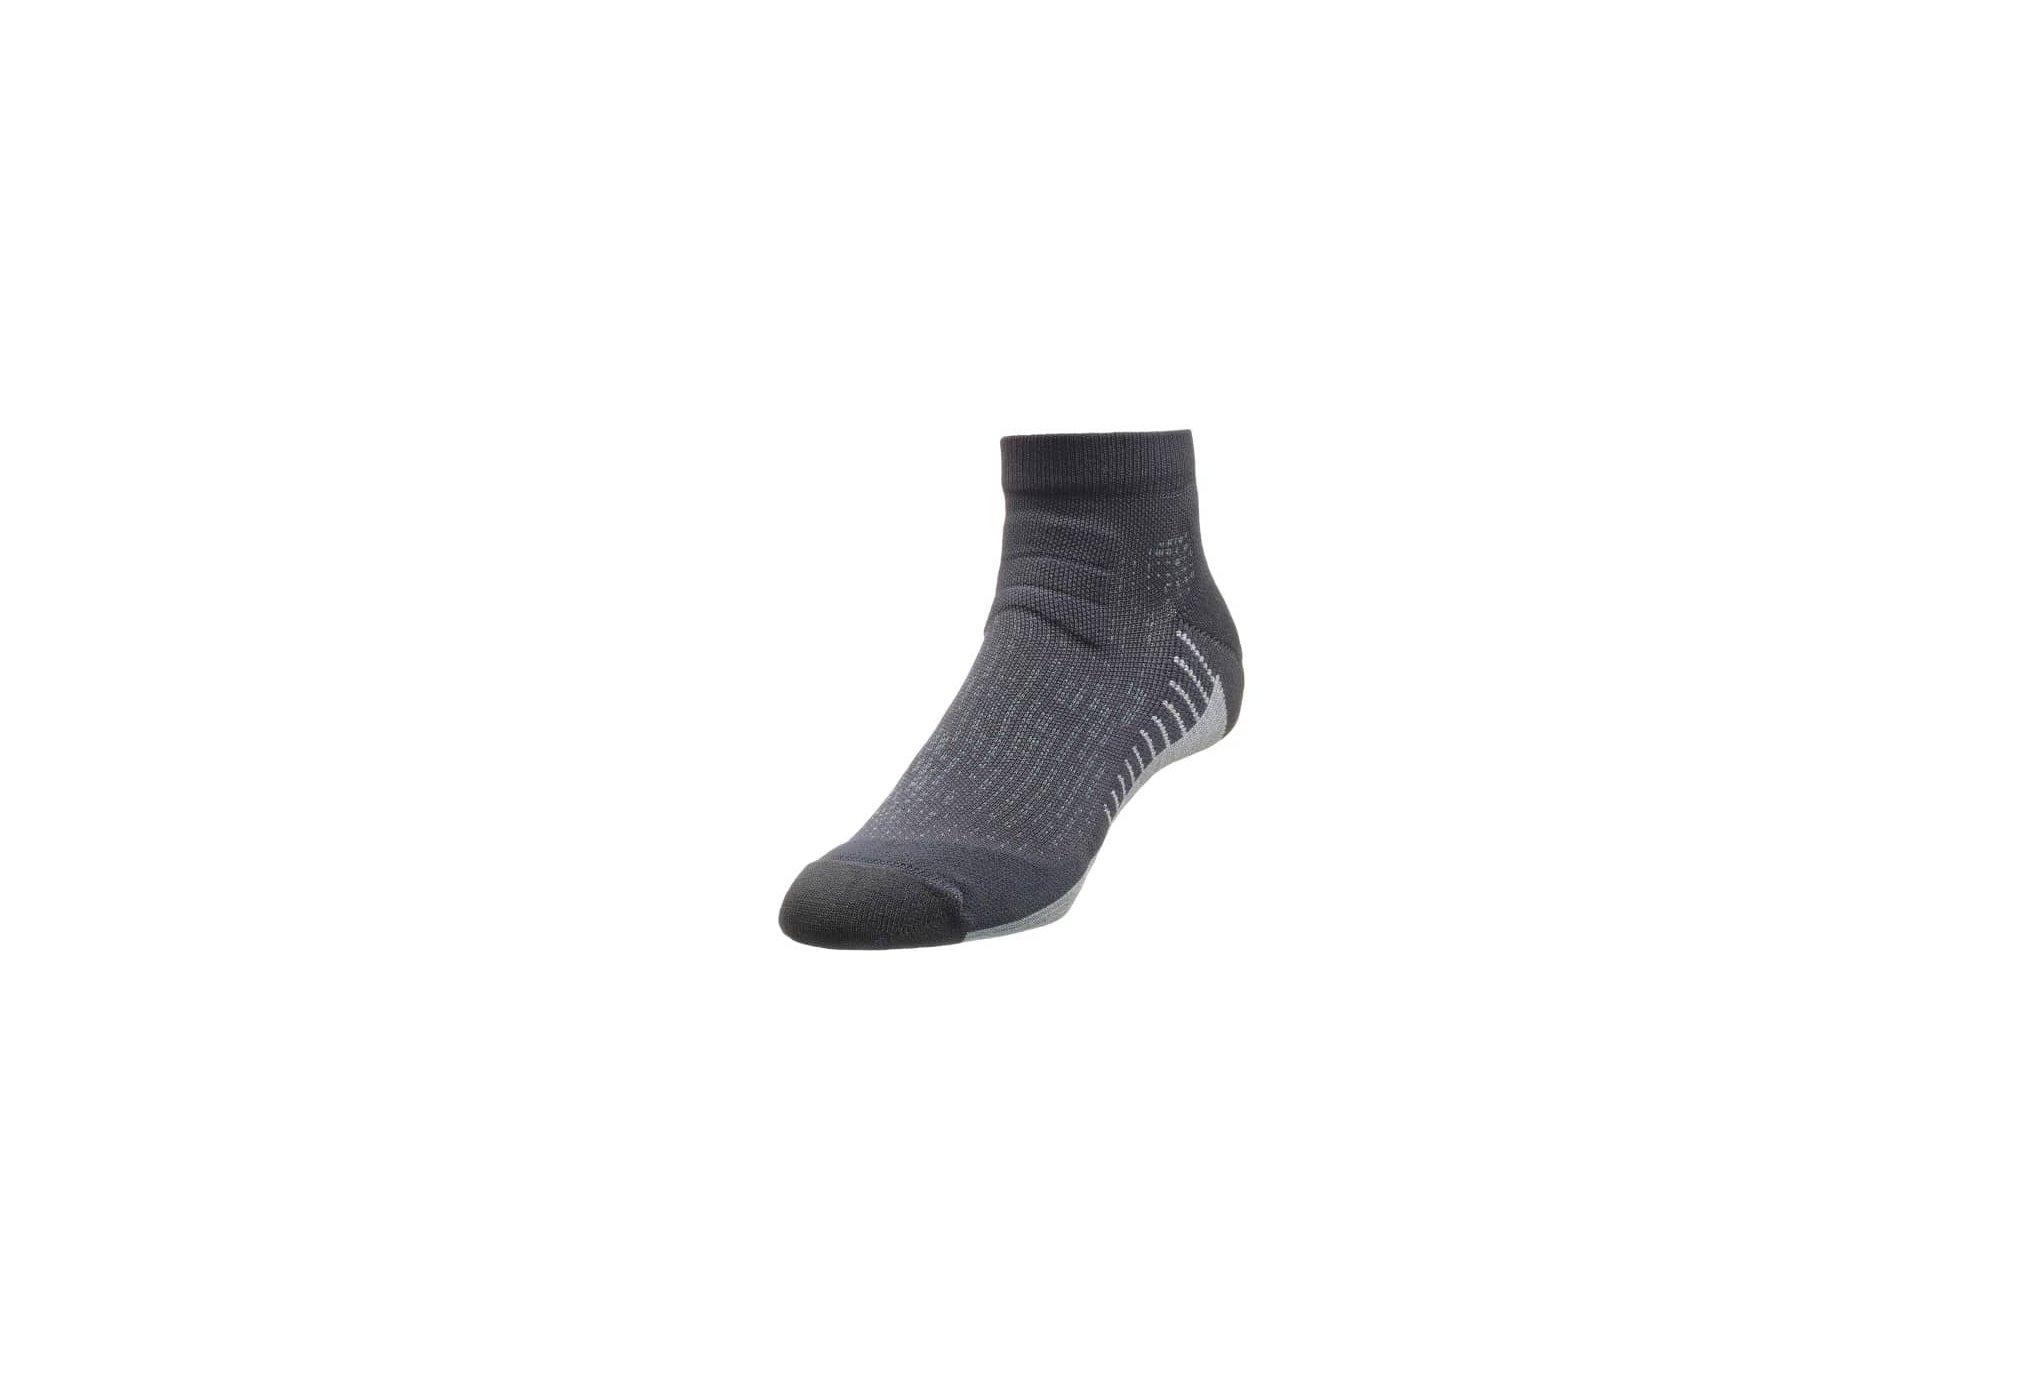 Asics Ultra Comfort Quarter Chaussettes